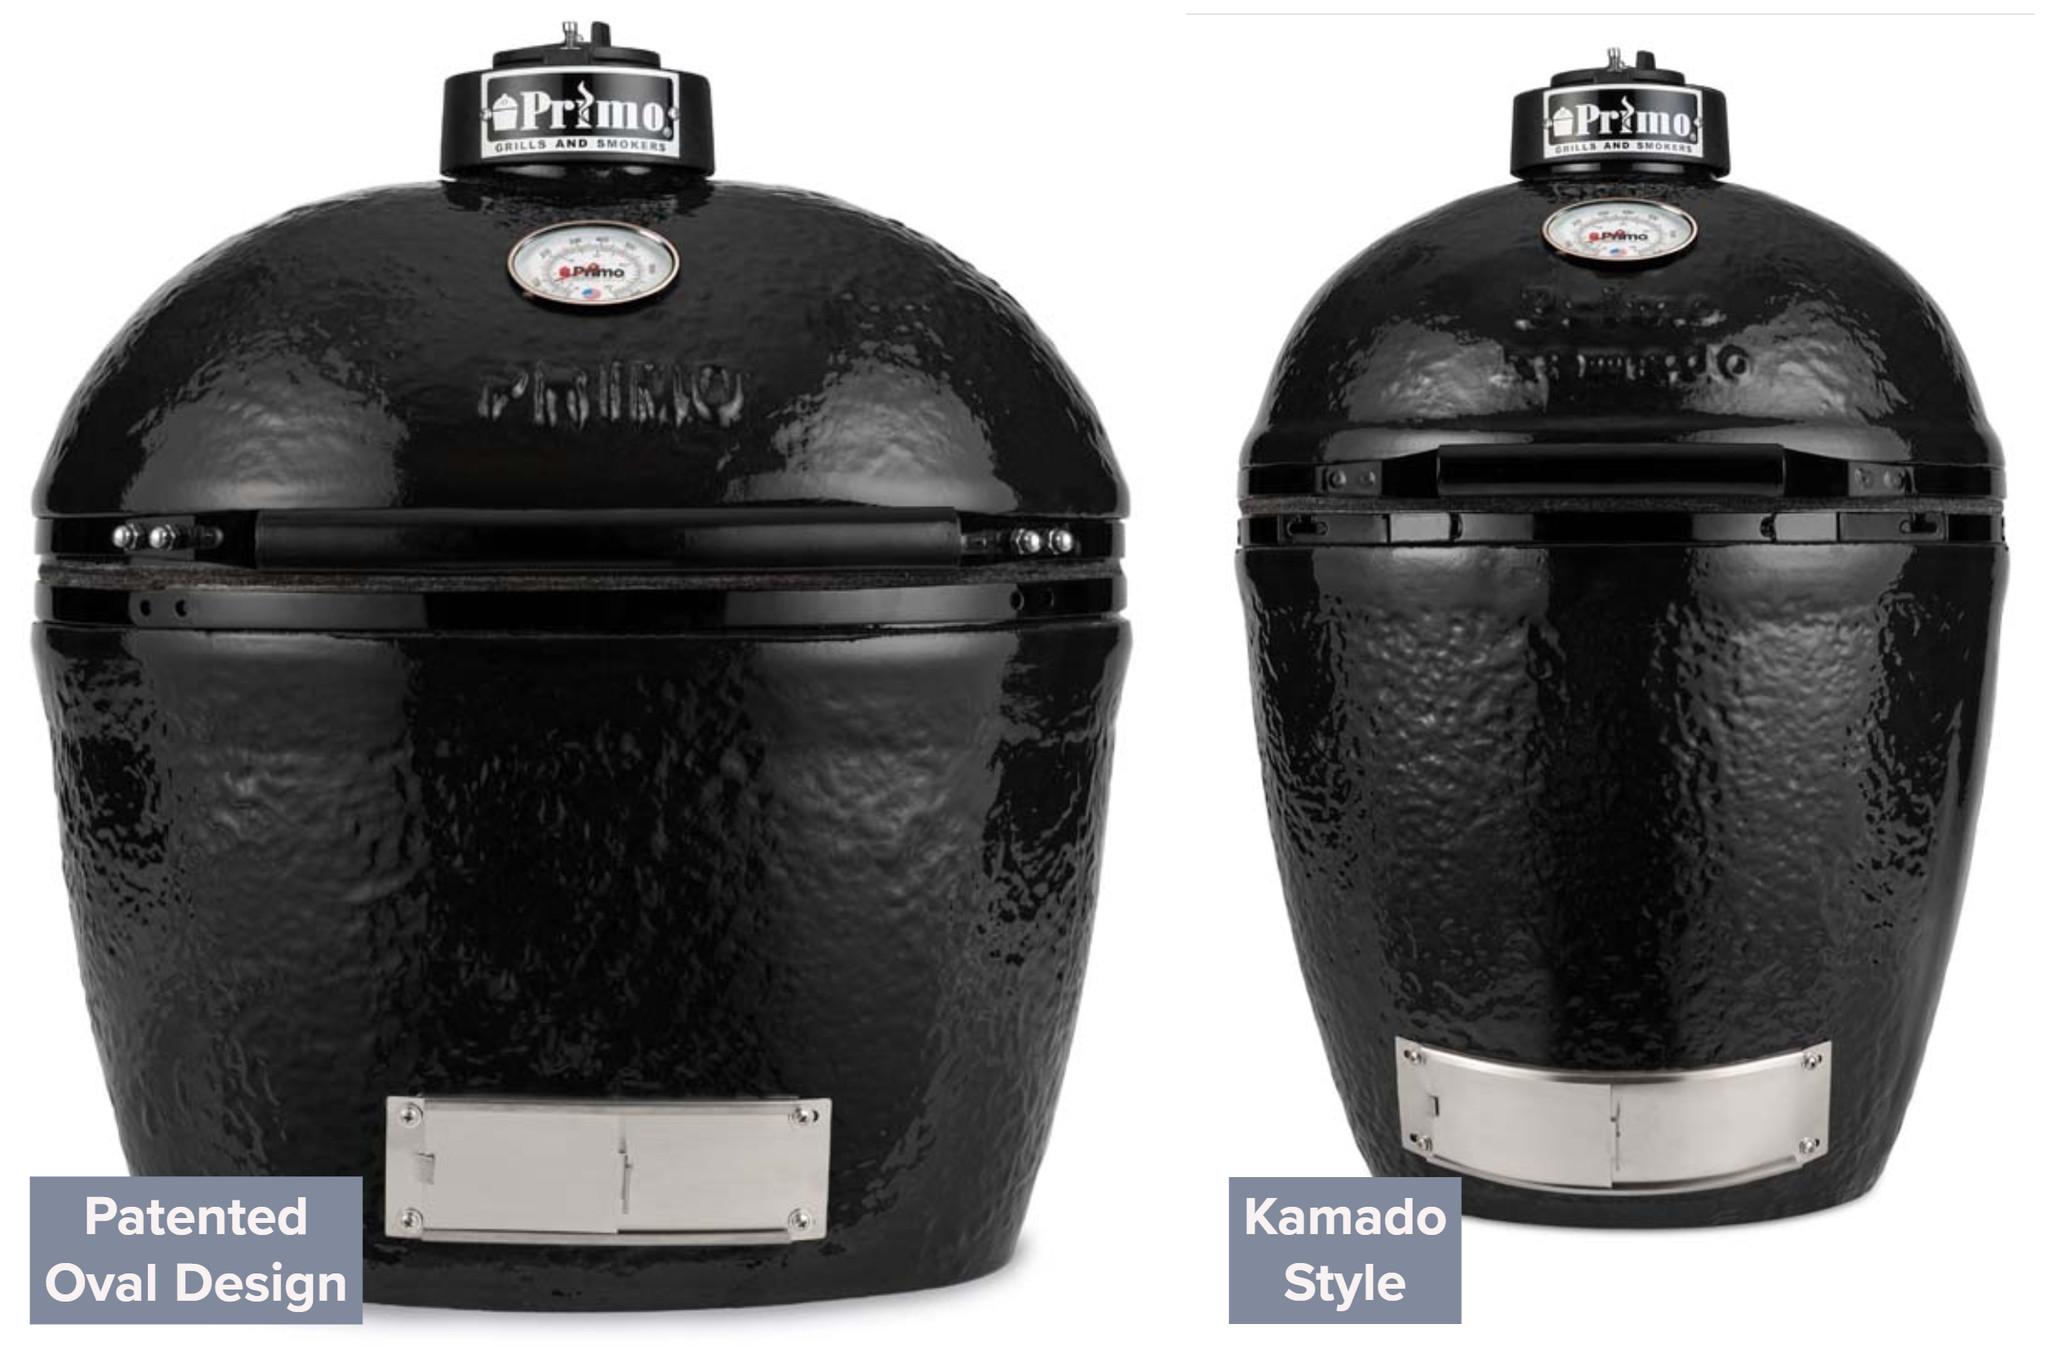 Primo Ceramic Grills XL 400 and Kamado